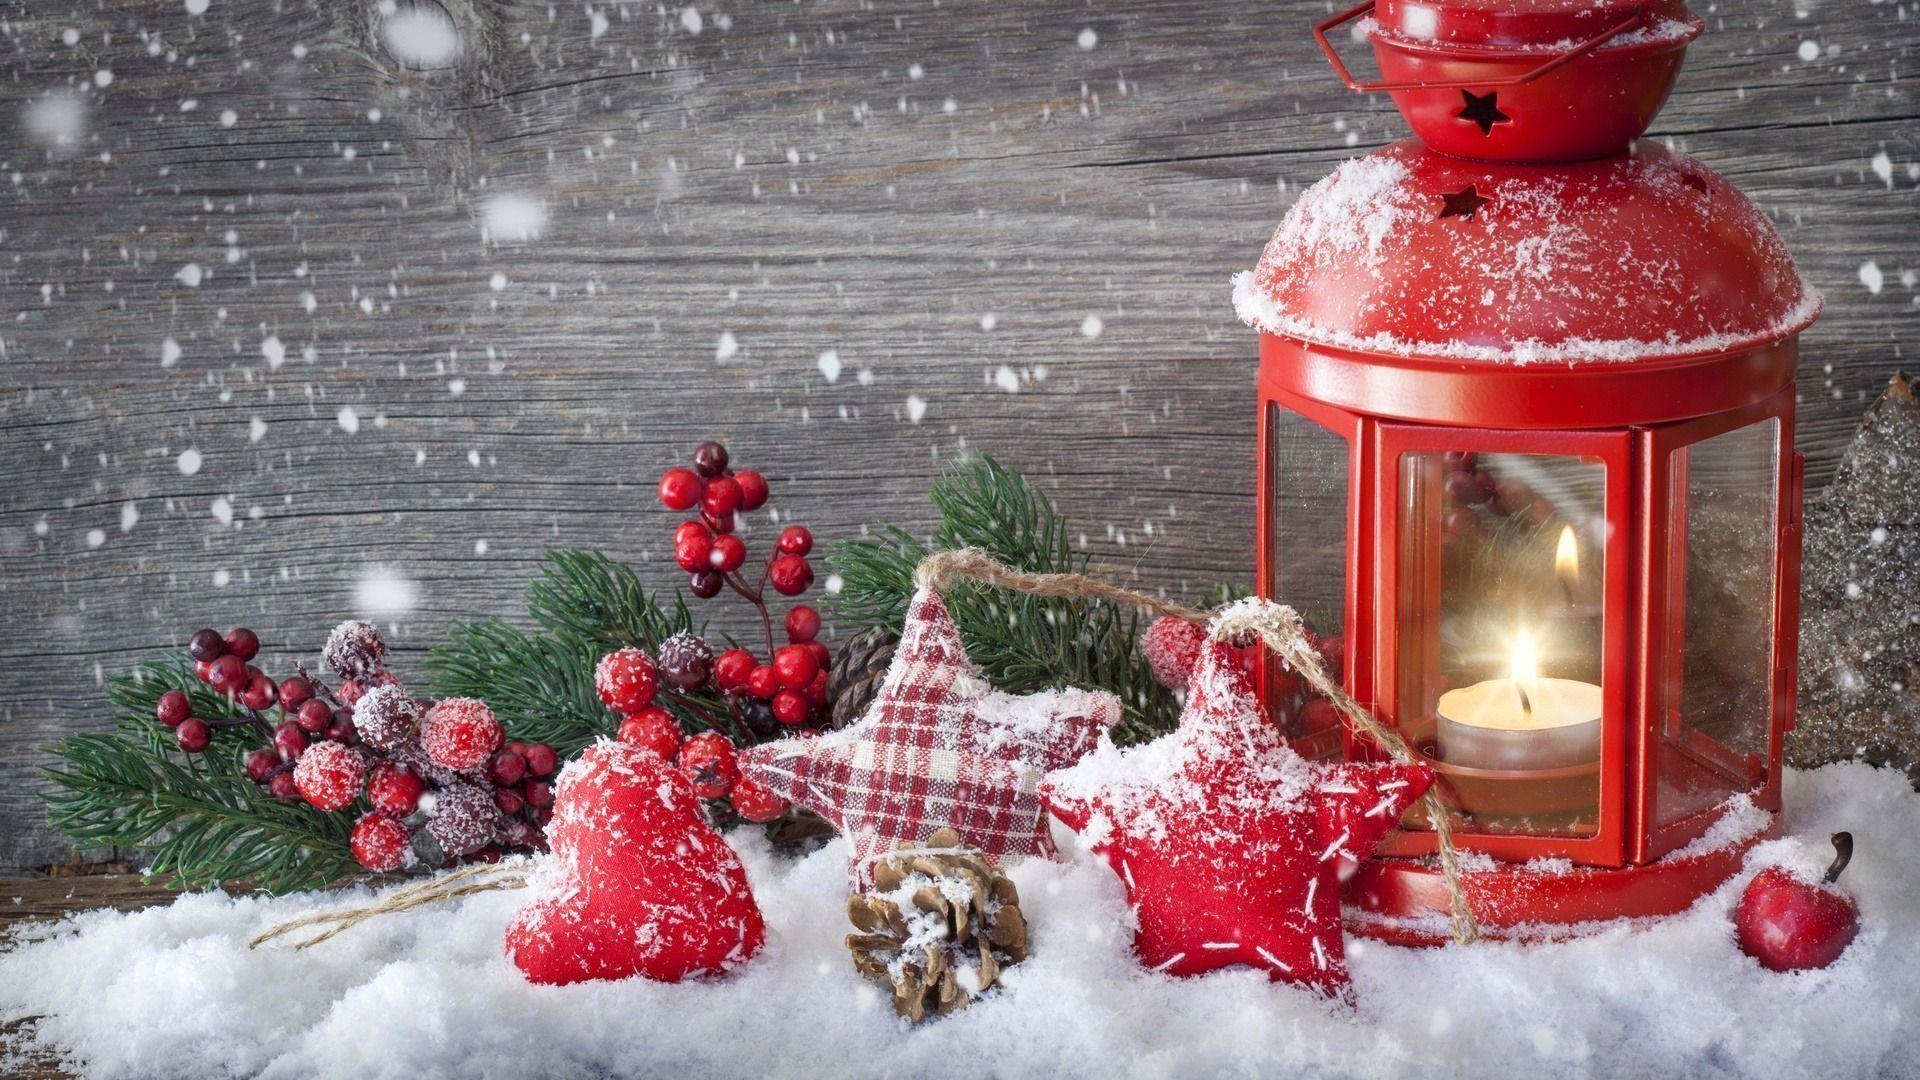 Snow Christmas Wallpaper